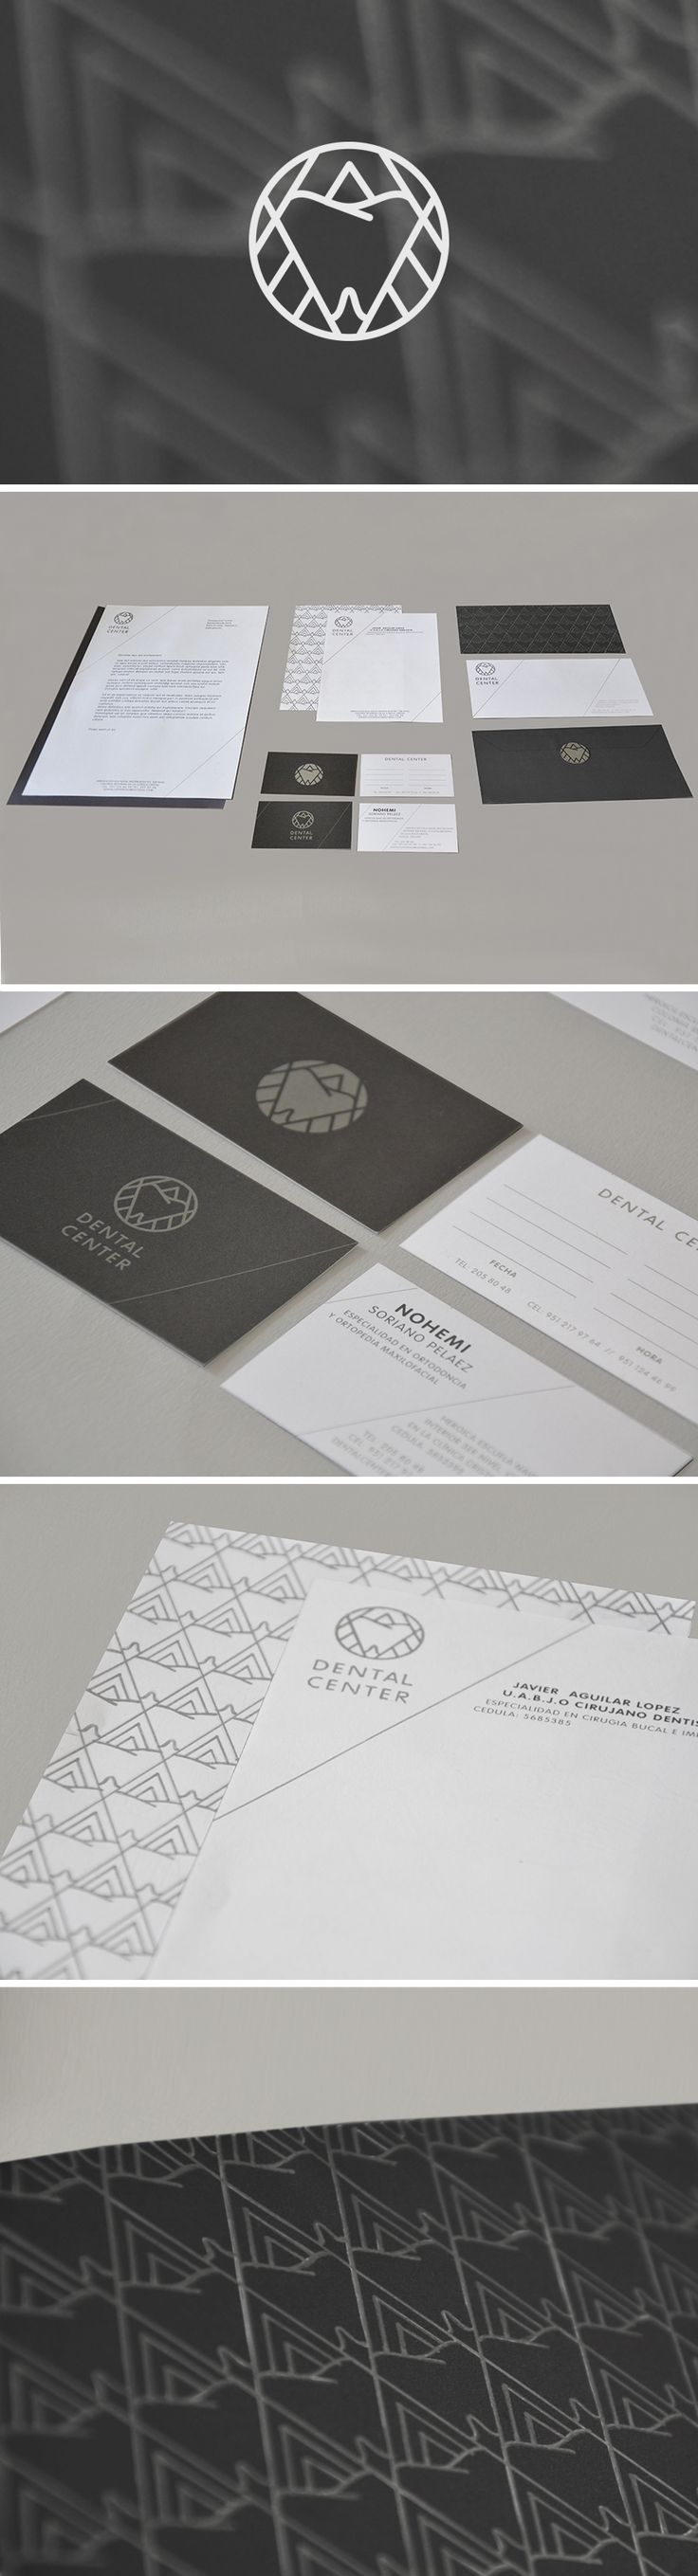 Designer: Flor Aguilar  ::::: Logo, Corporate identity for Dental Center